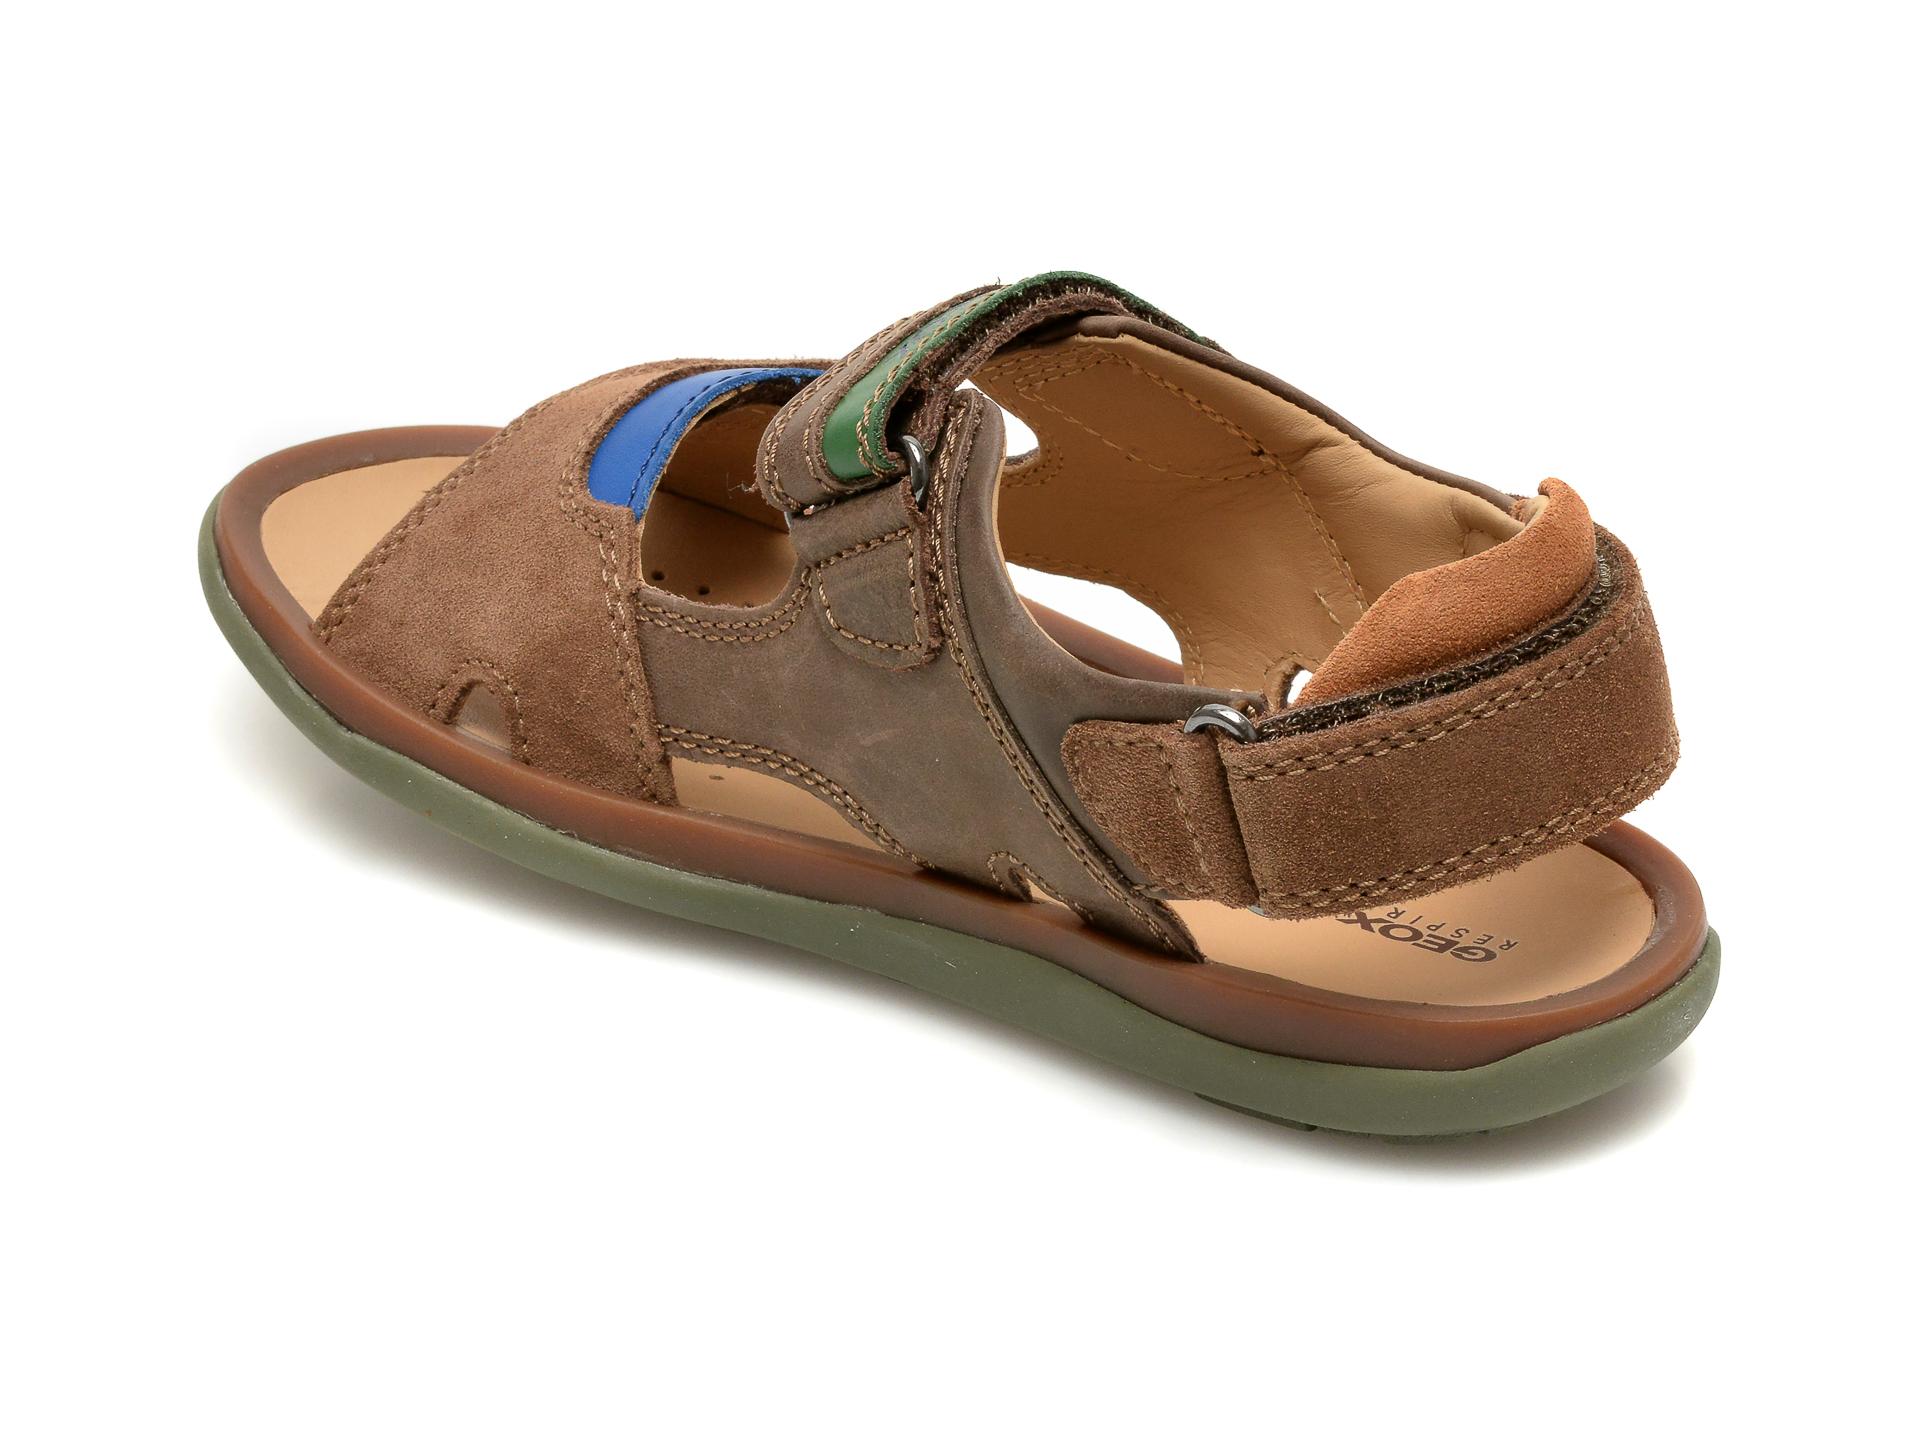 Sandale GEOX maro, J02BBB, din piele naturala - 5